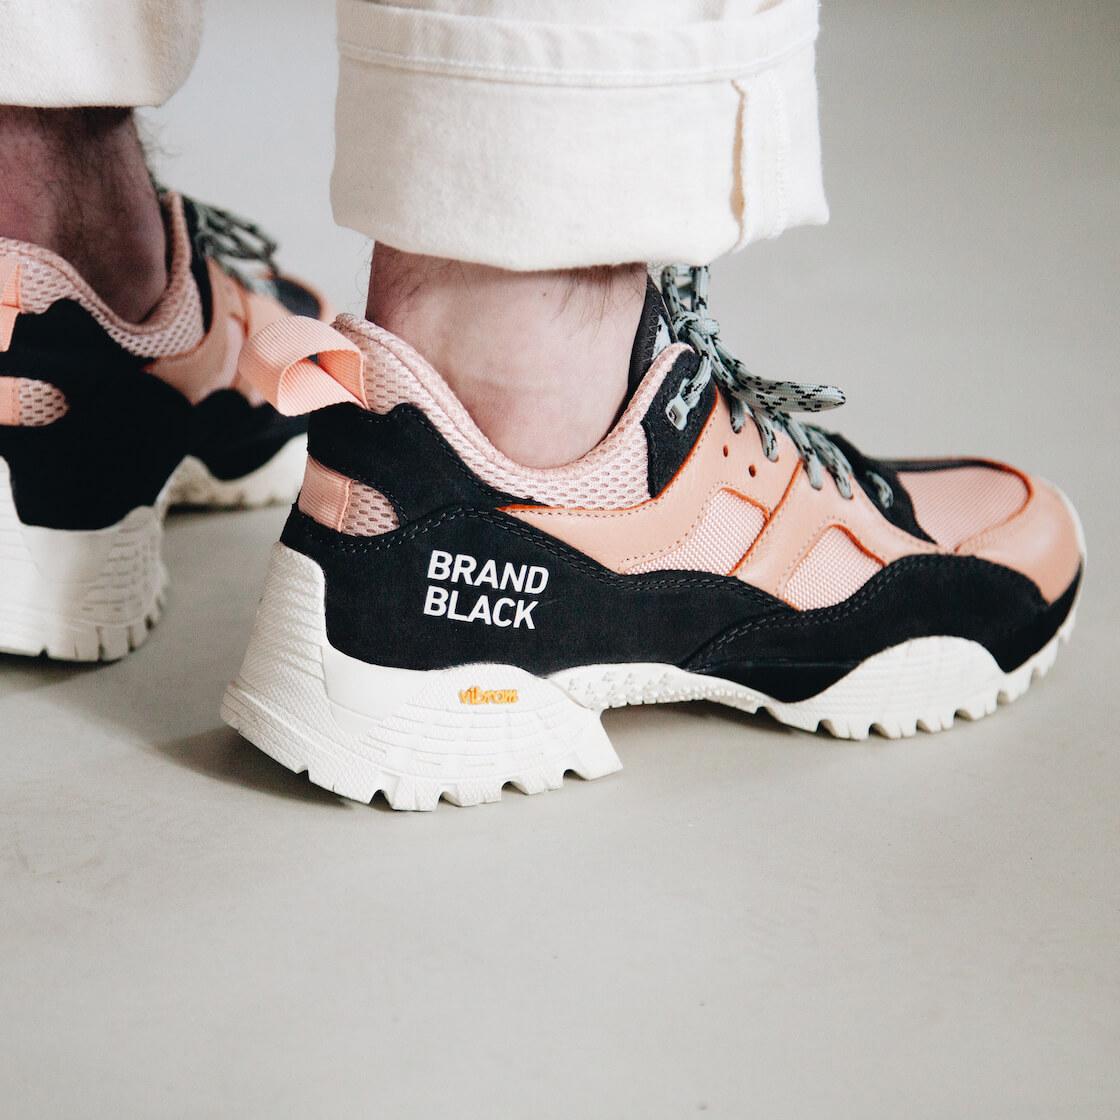 brandblack cresta shoes on body